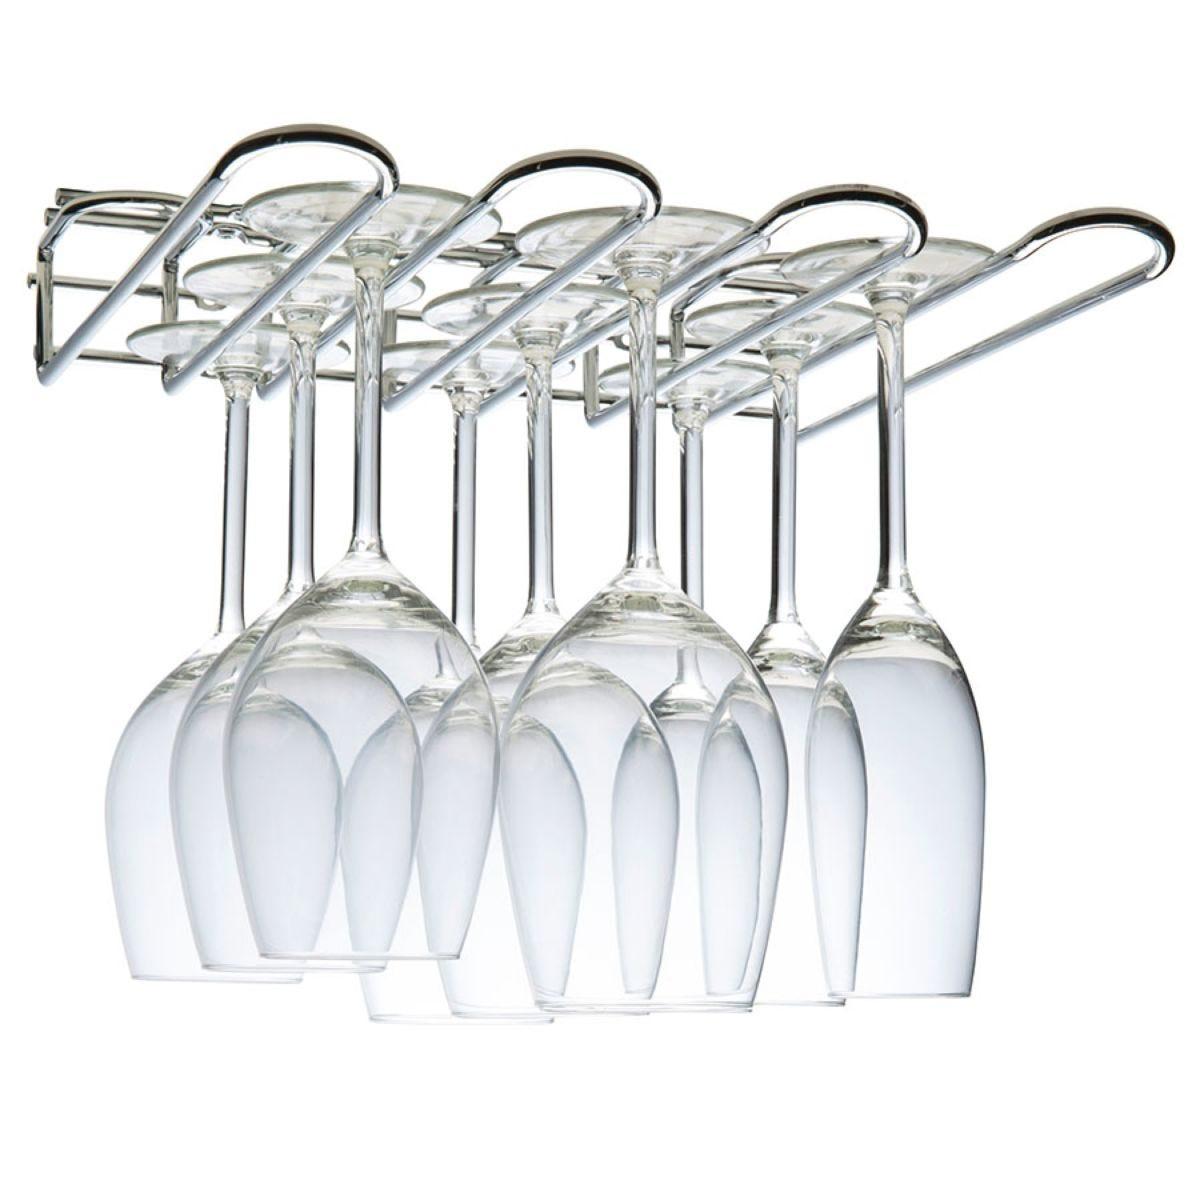 Hahn Metal Wall / Under-Cupboard 3 Row Glass Stem Rack - Chrome